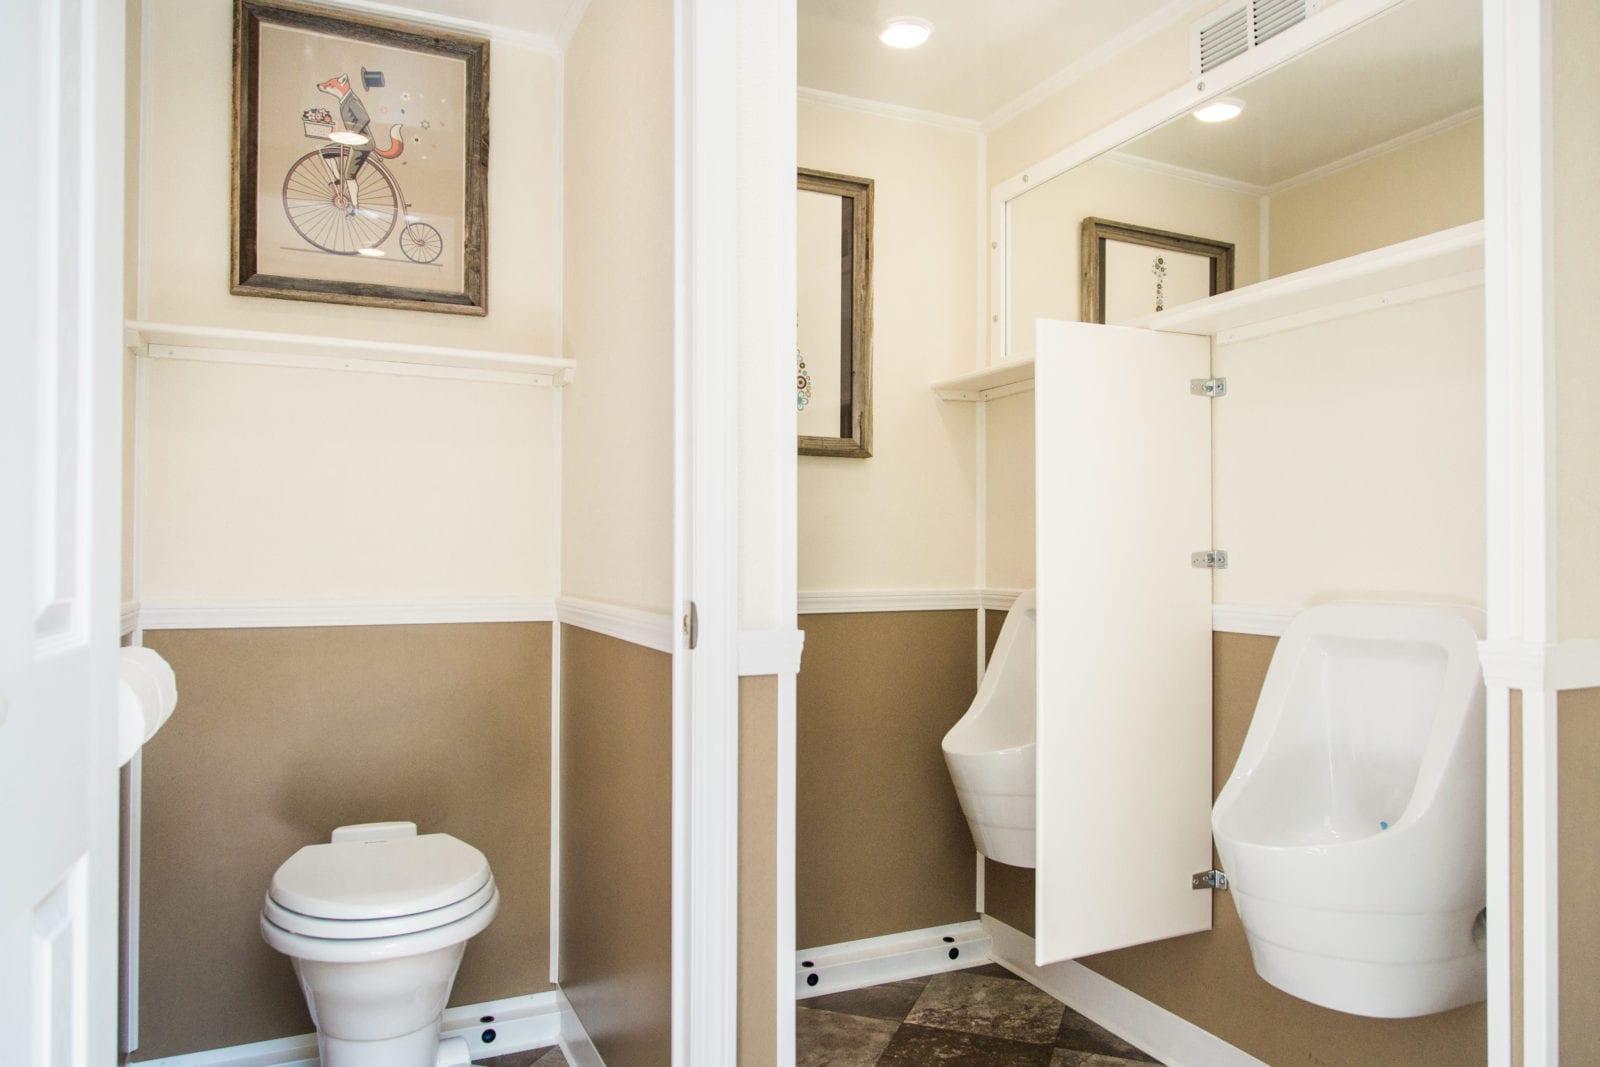 Portable Toilet Exhibition : Texas luxury portable restroom toilet trailers rentals in texas